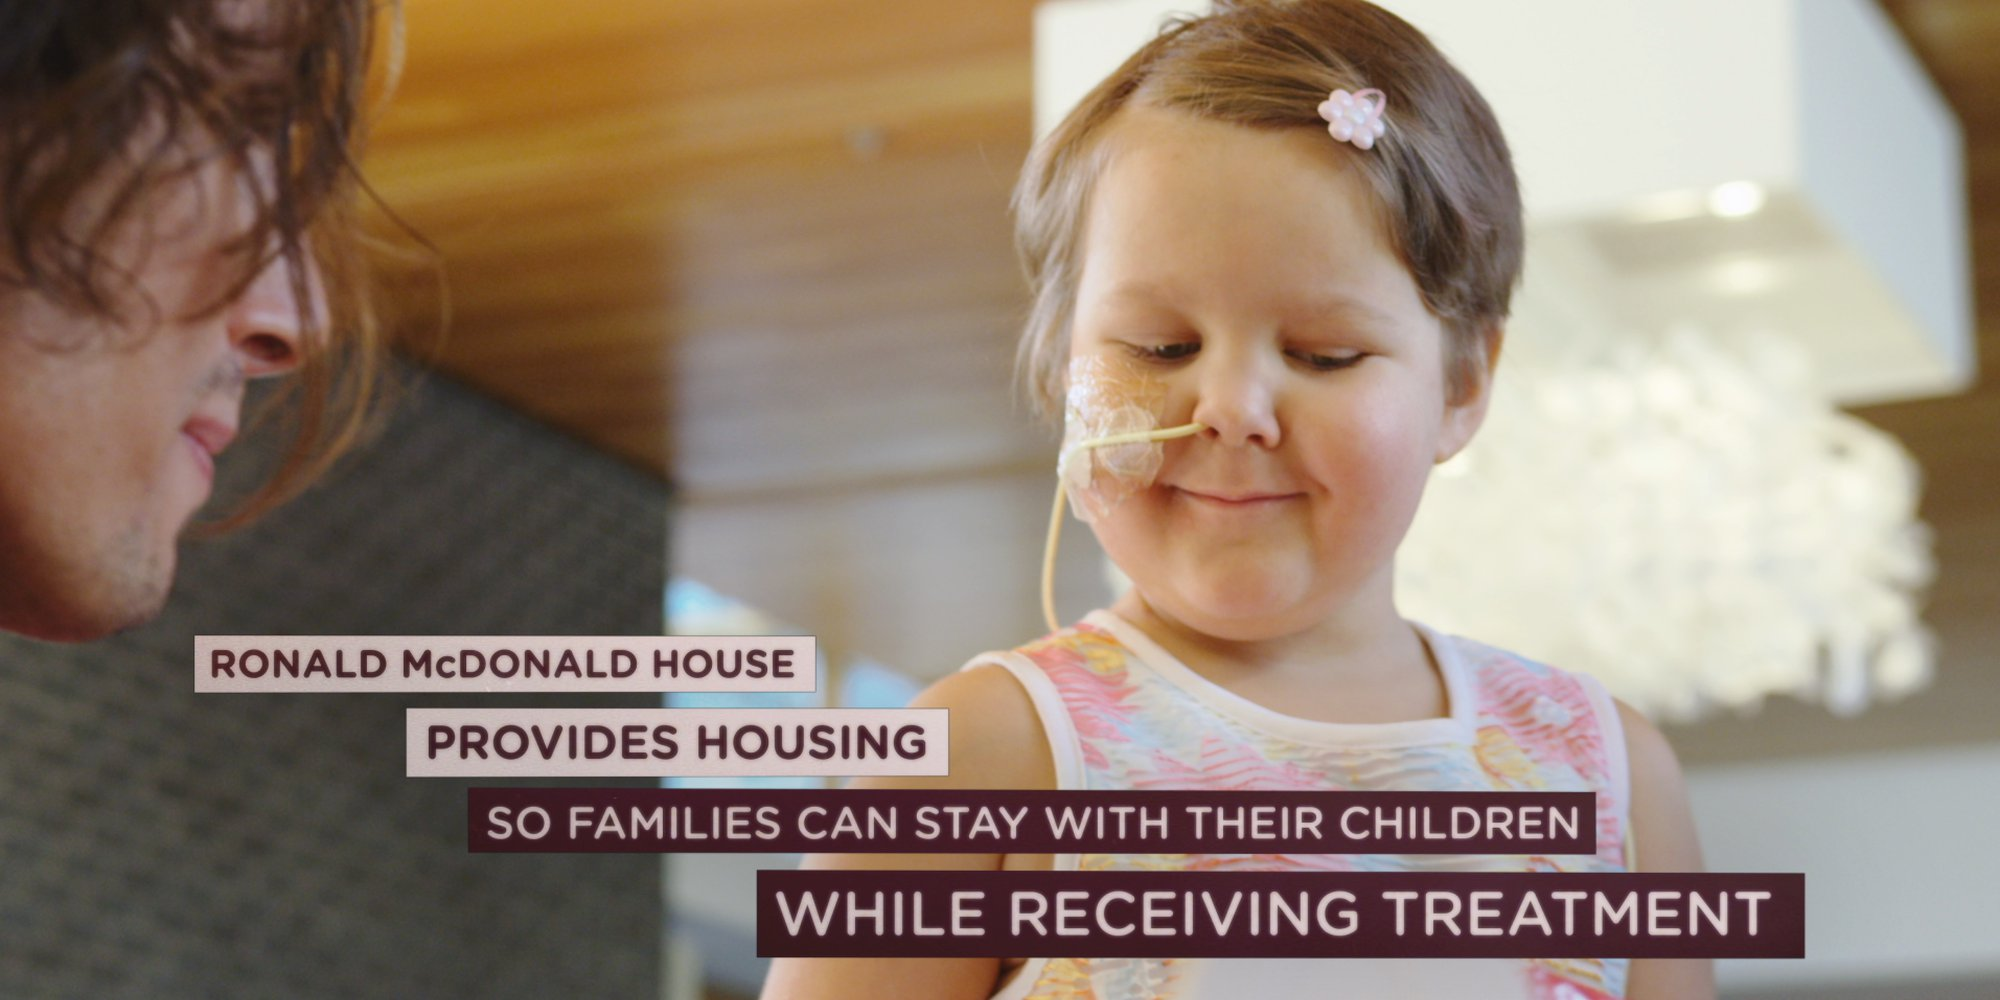 Marianas Trench donated toys to kids at Ronald McDonald House, BC